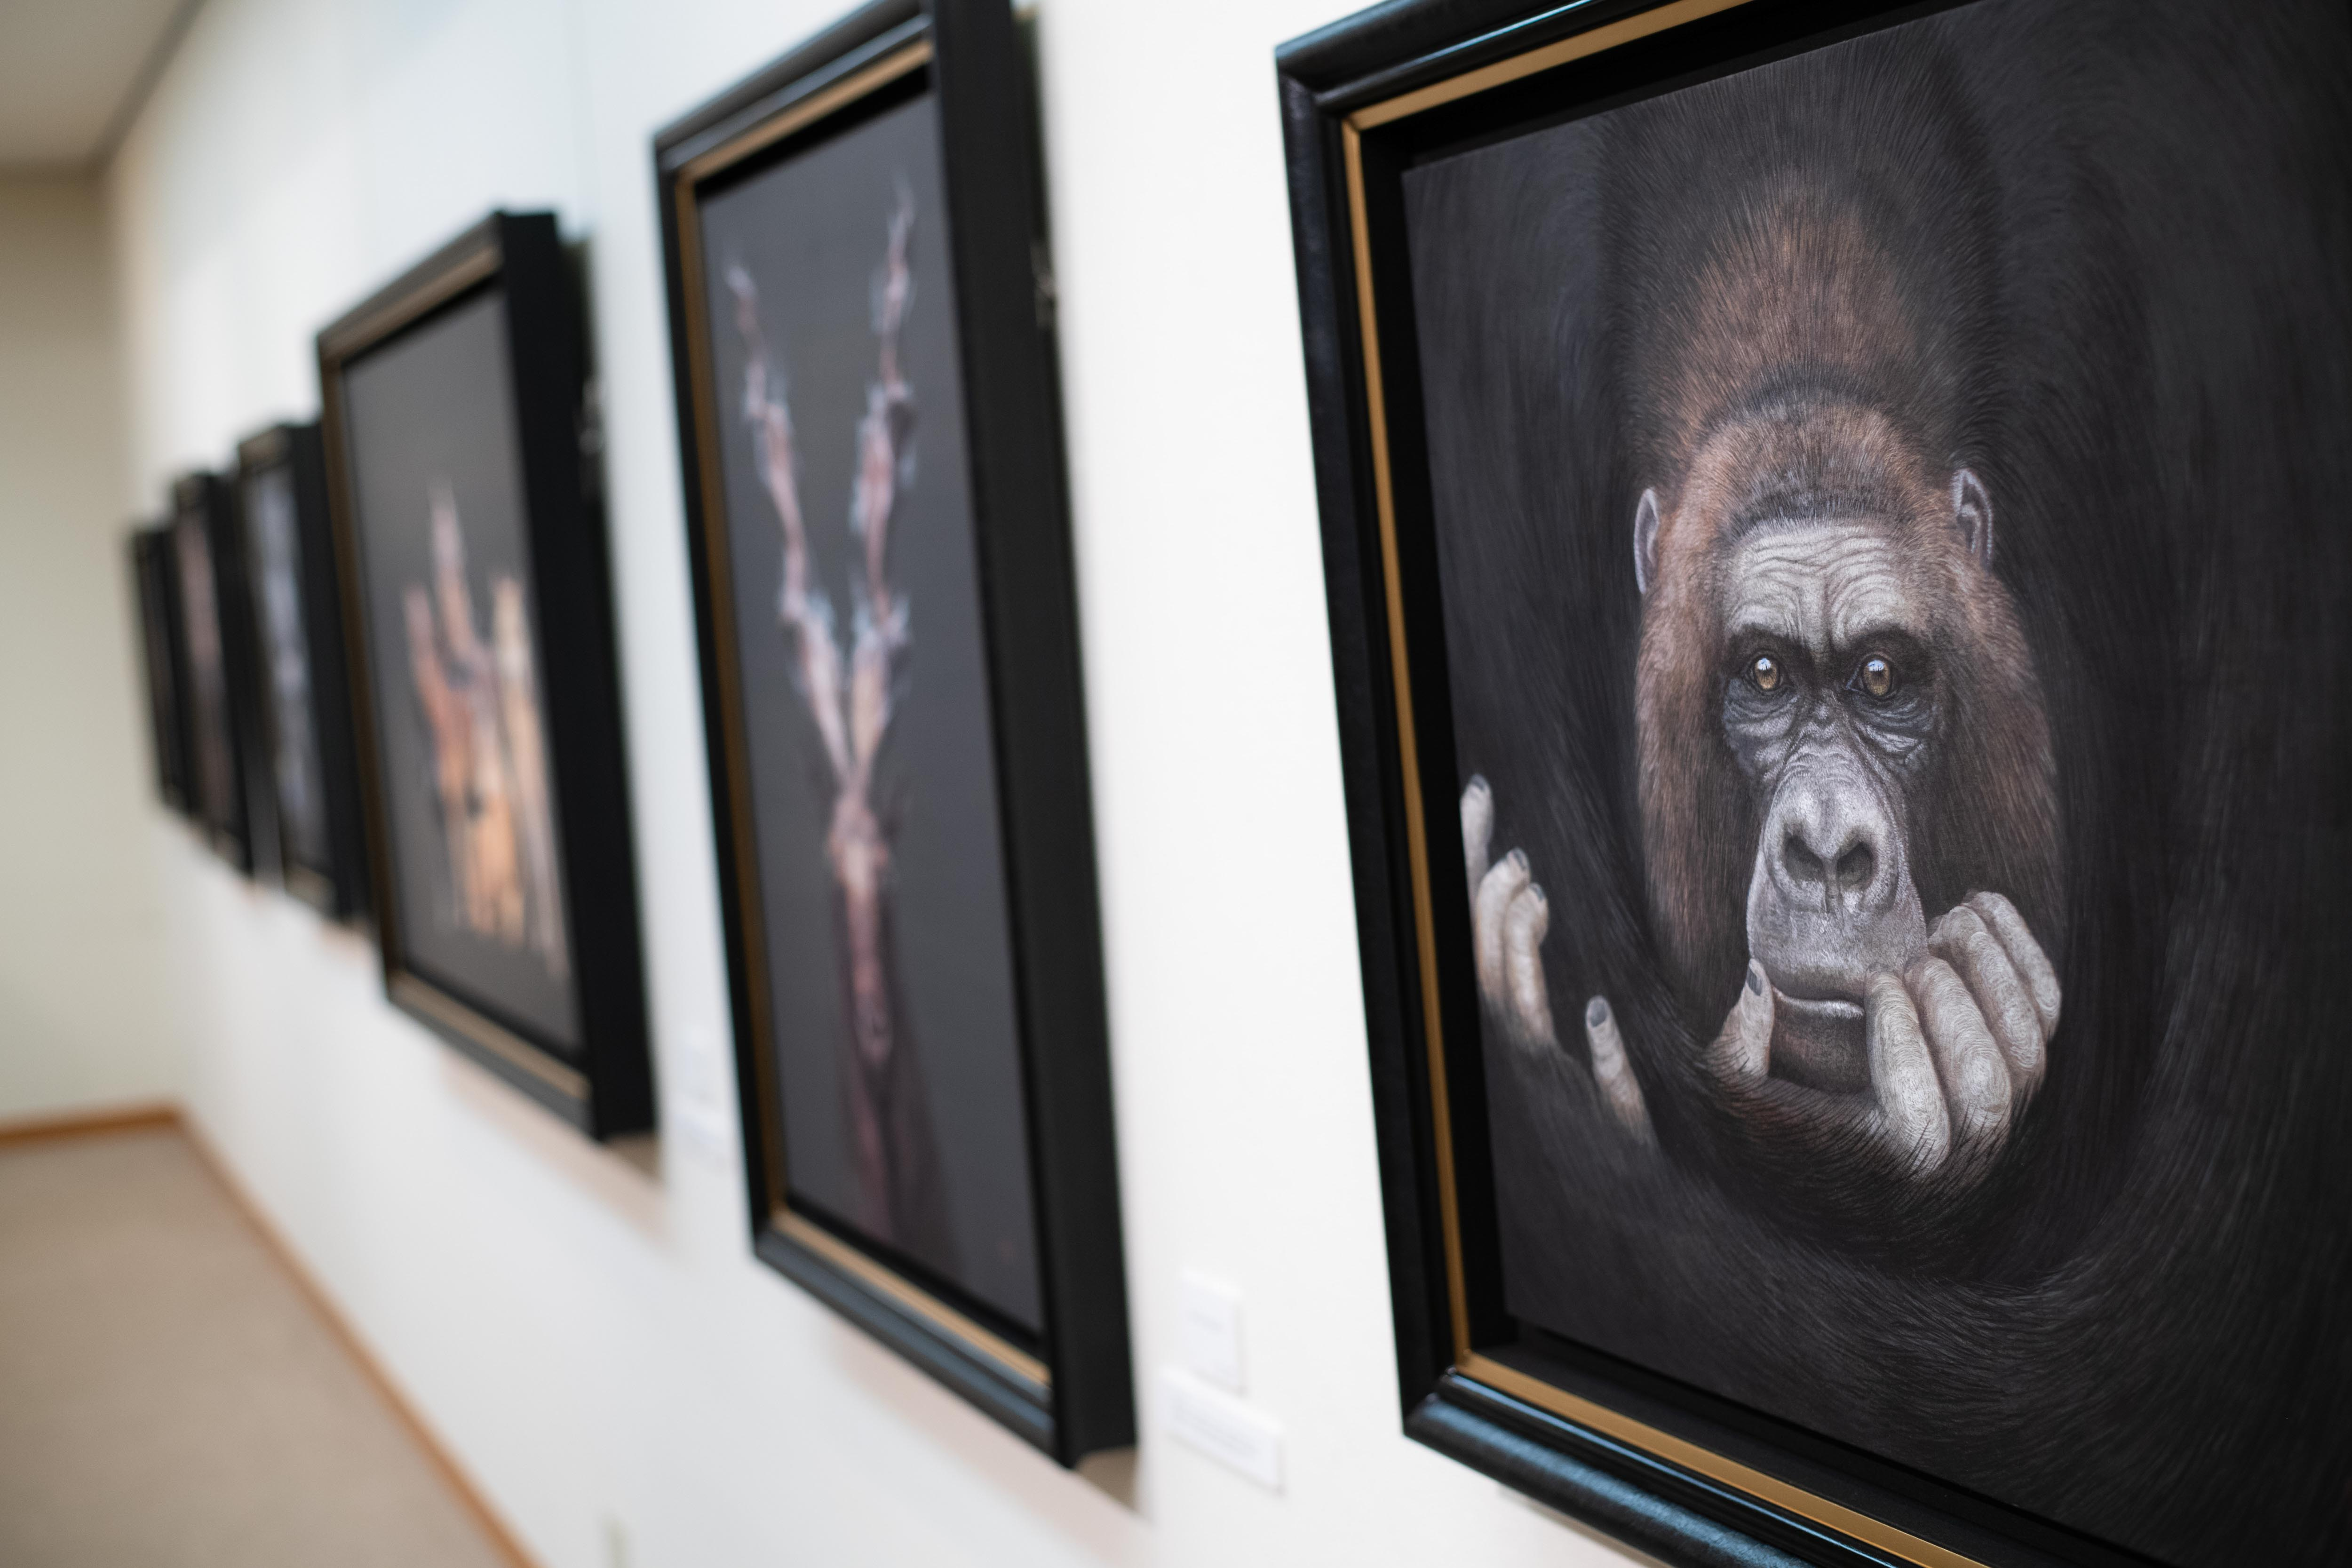 https://kanakokinutani.com/exhibition/image/S20201007-099.jpg